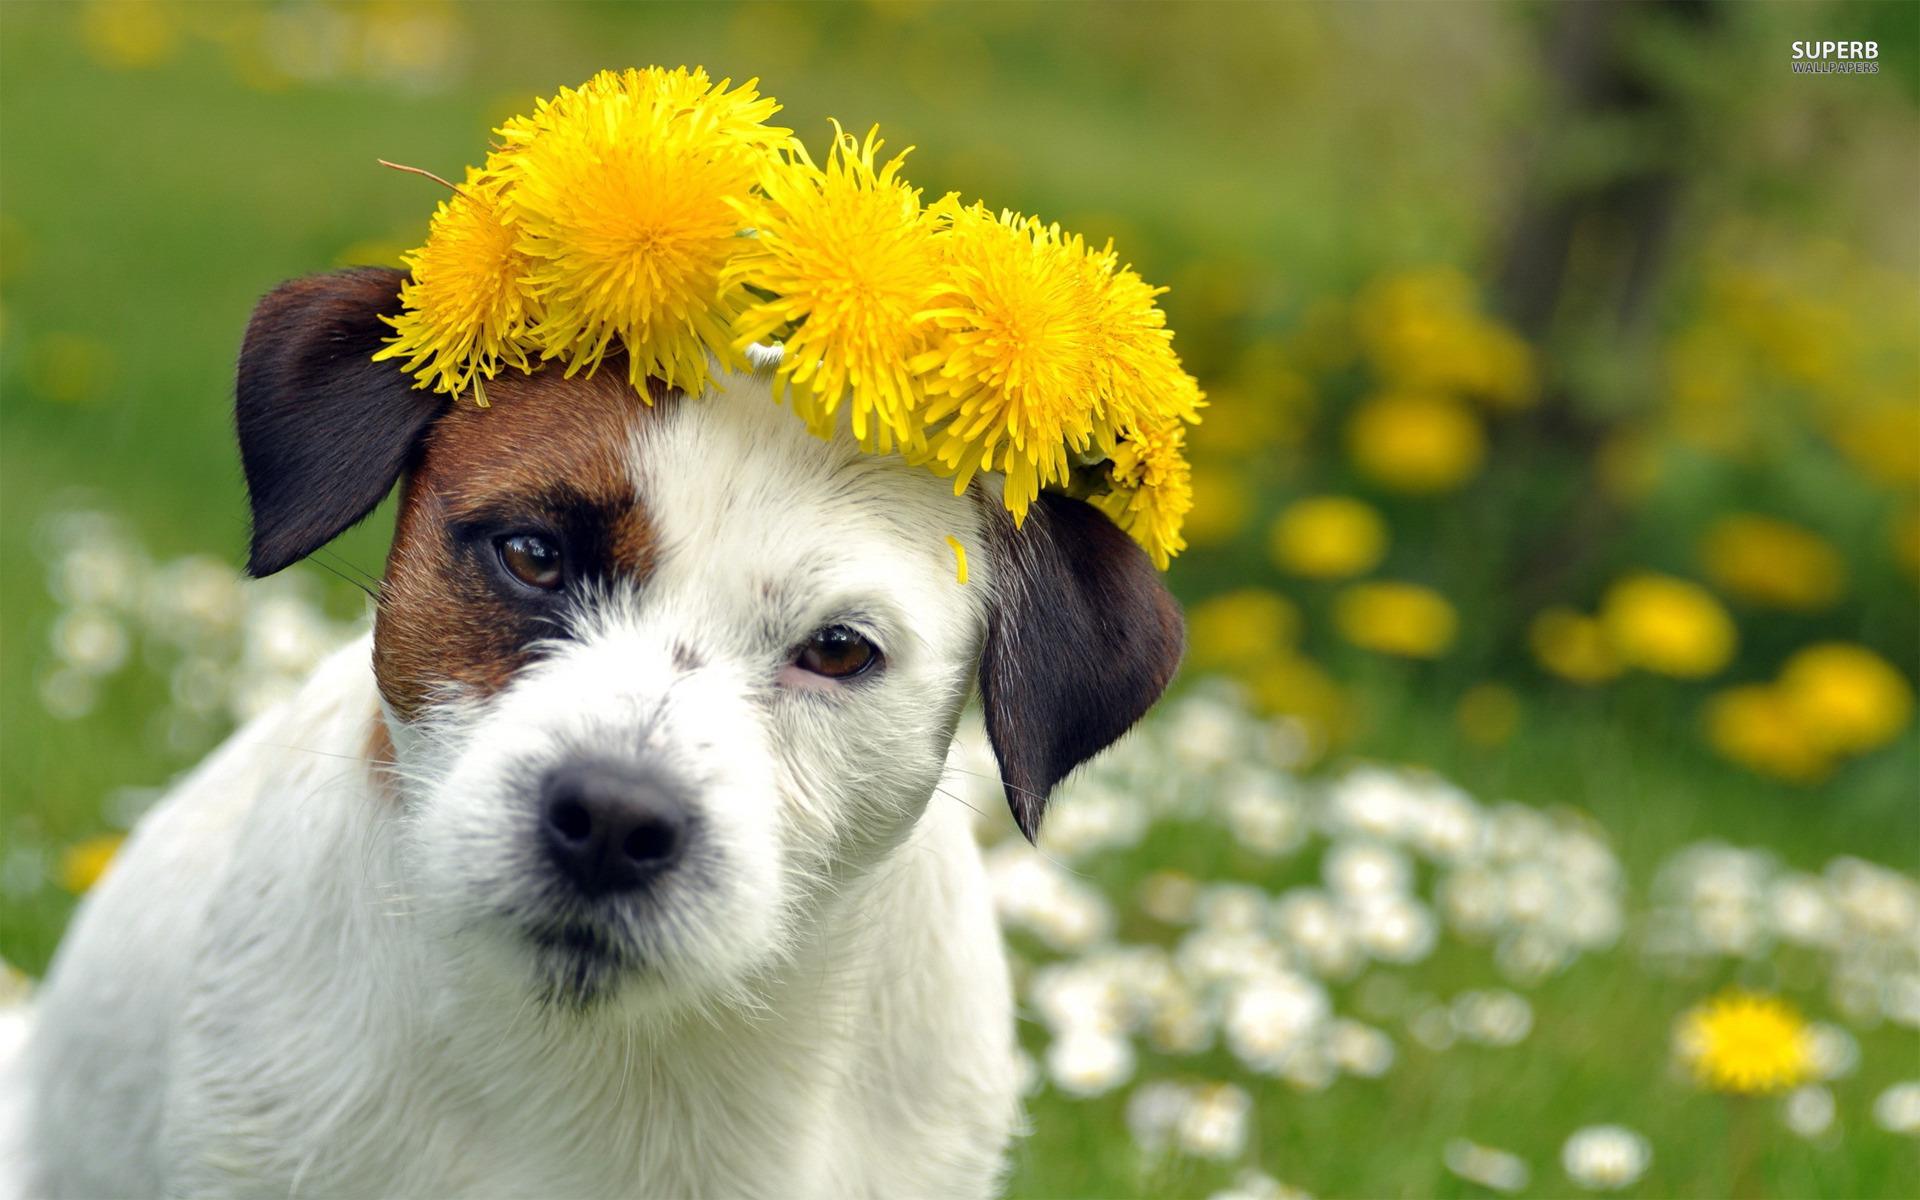 Dog Spring wallpaper   991282 1920x1200